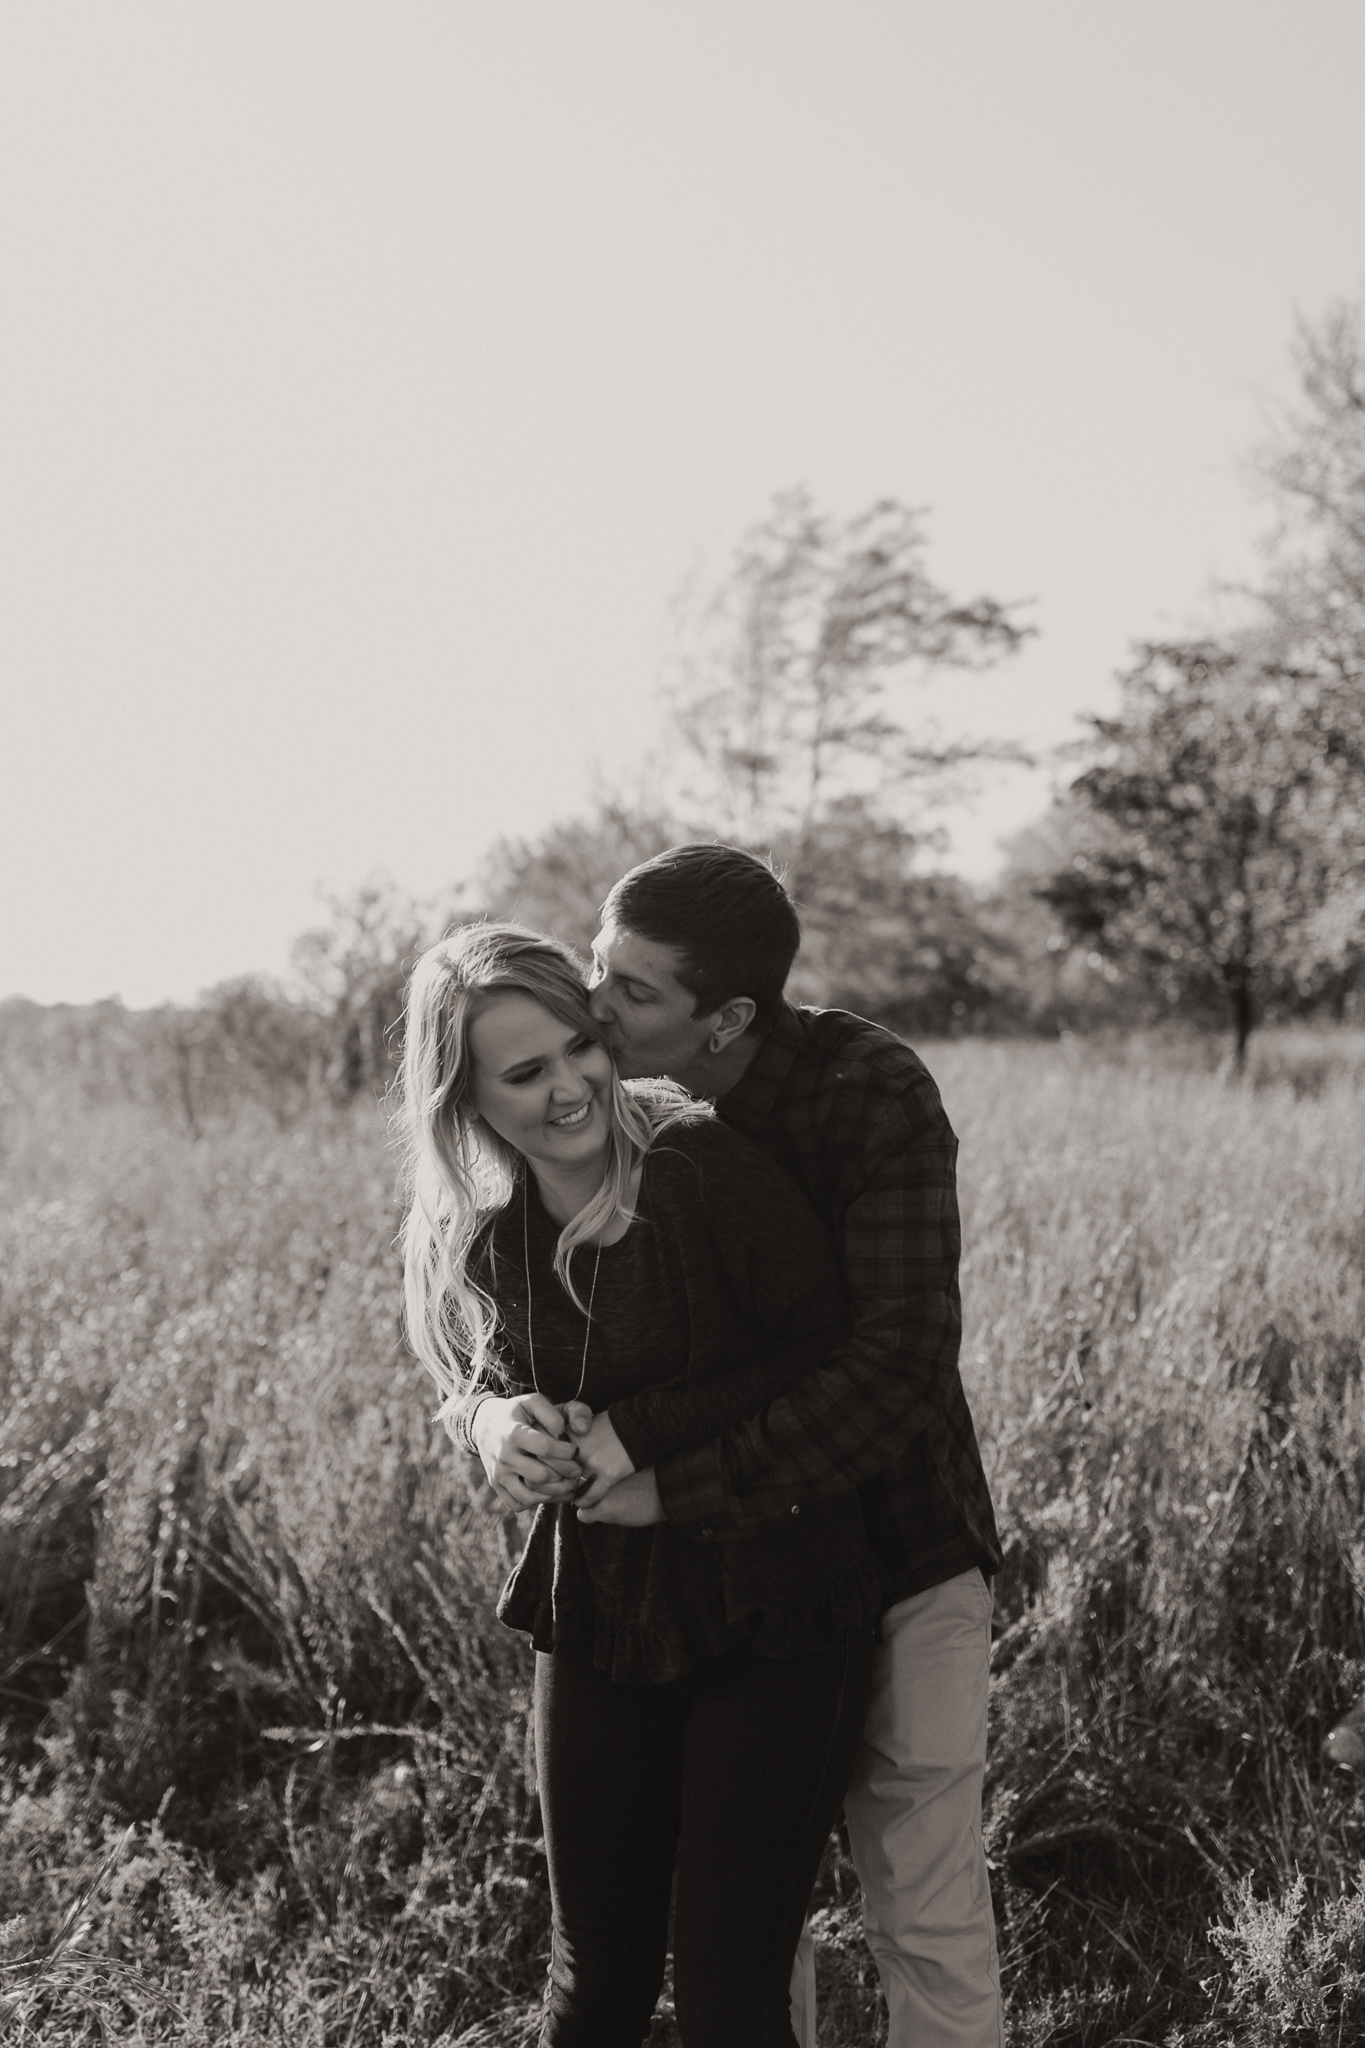 Kyle + Brittany   Fall Lake Engagement Photos   Oklahoma Lifestyle Photographer-1.jpg